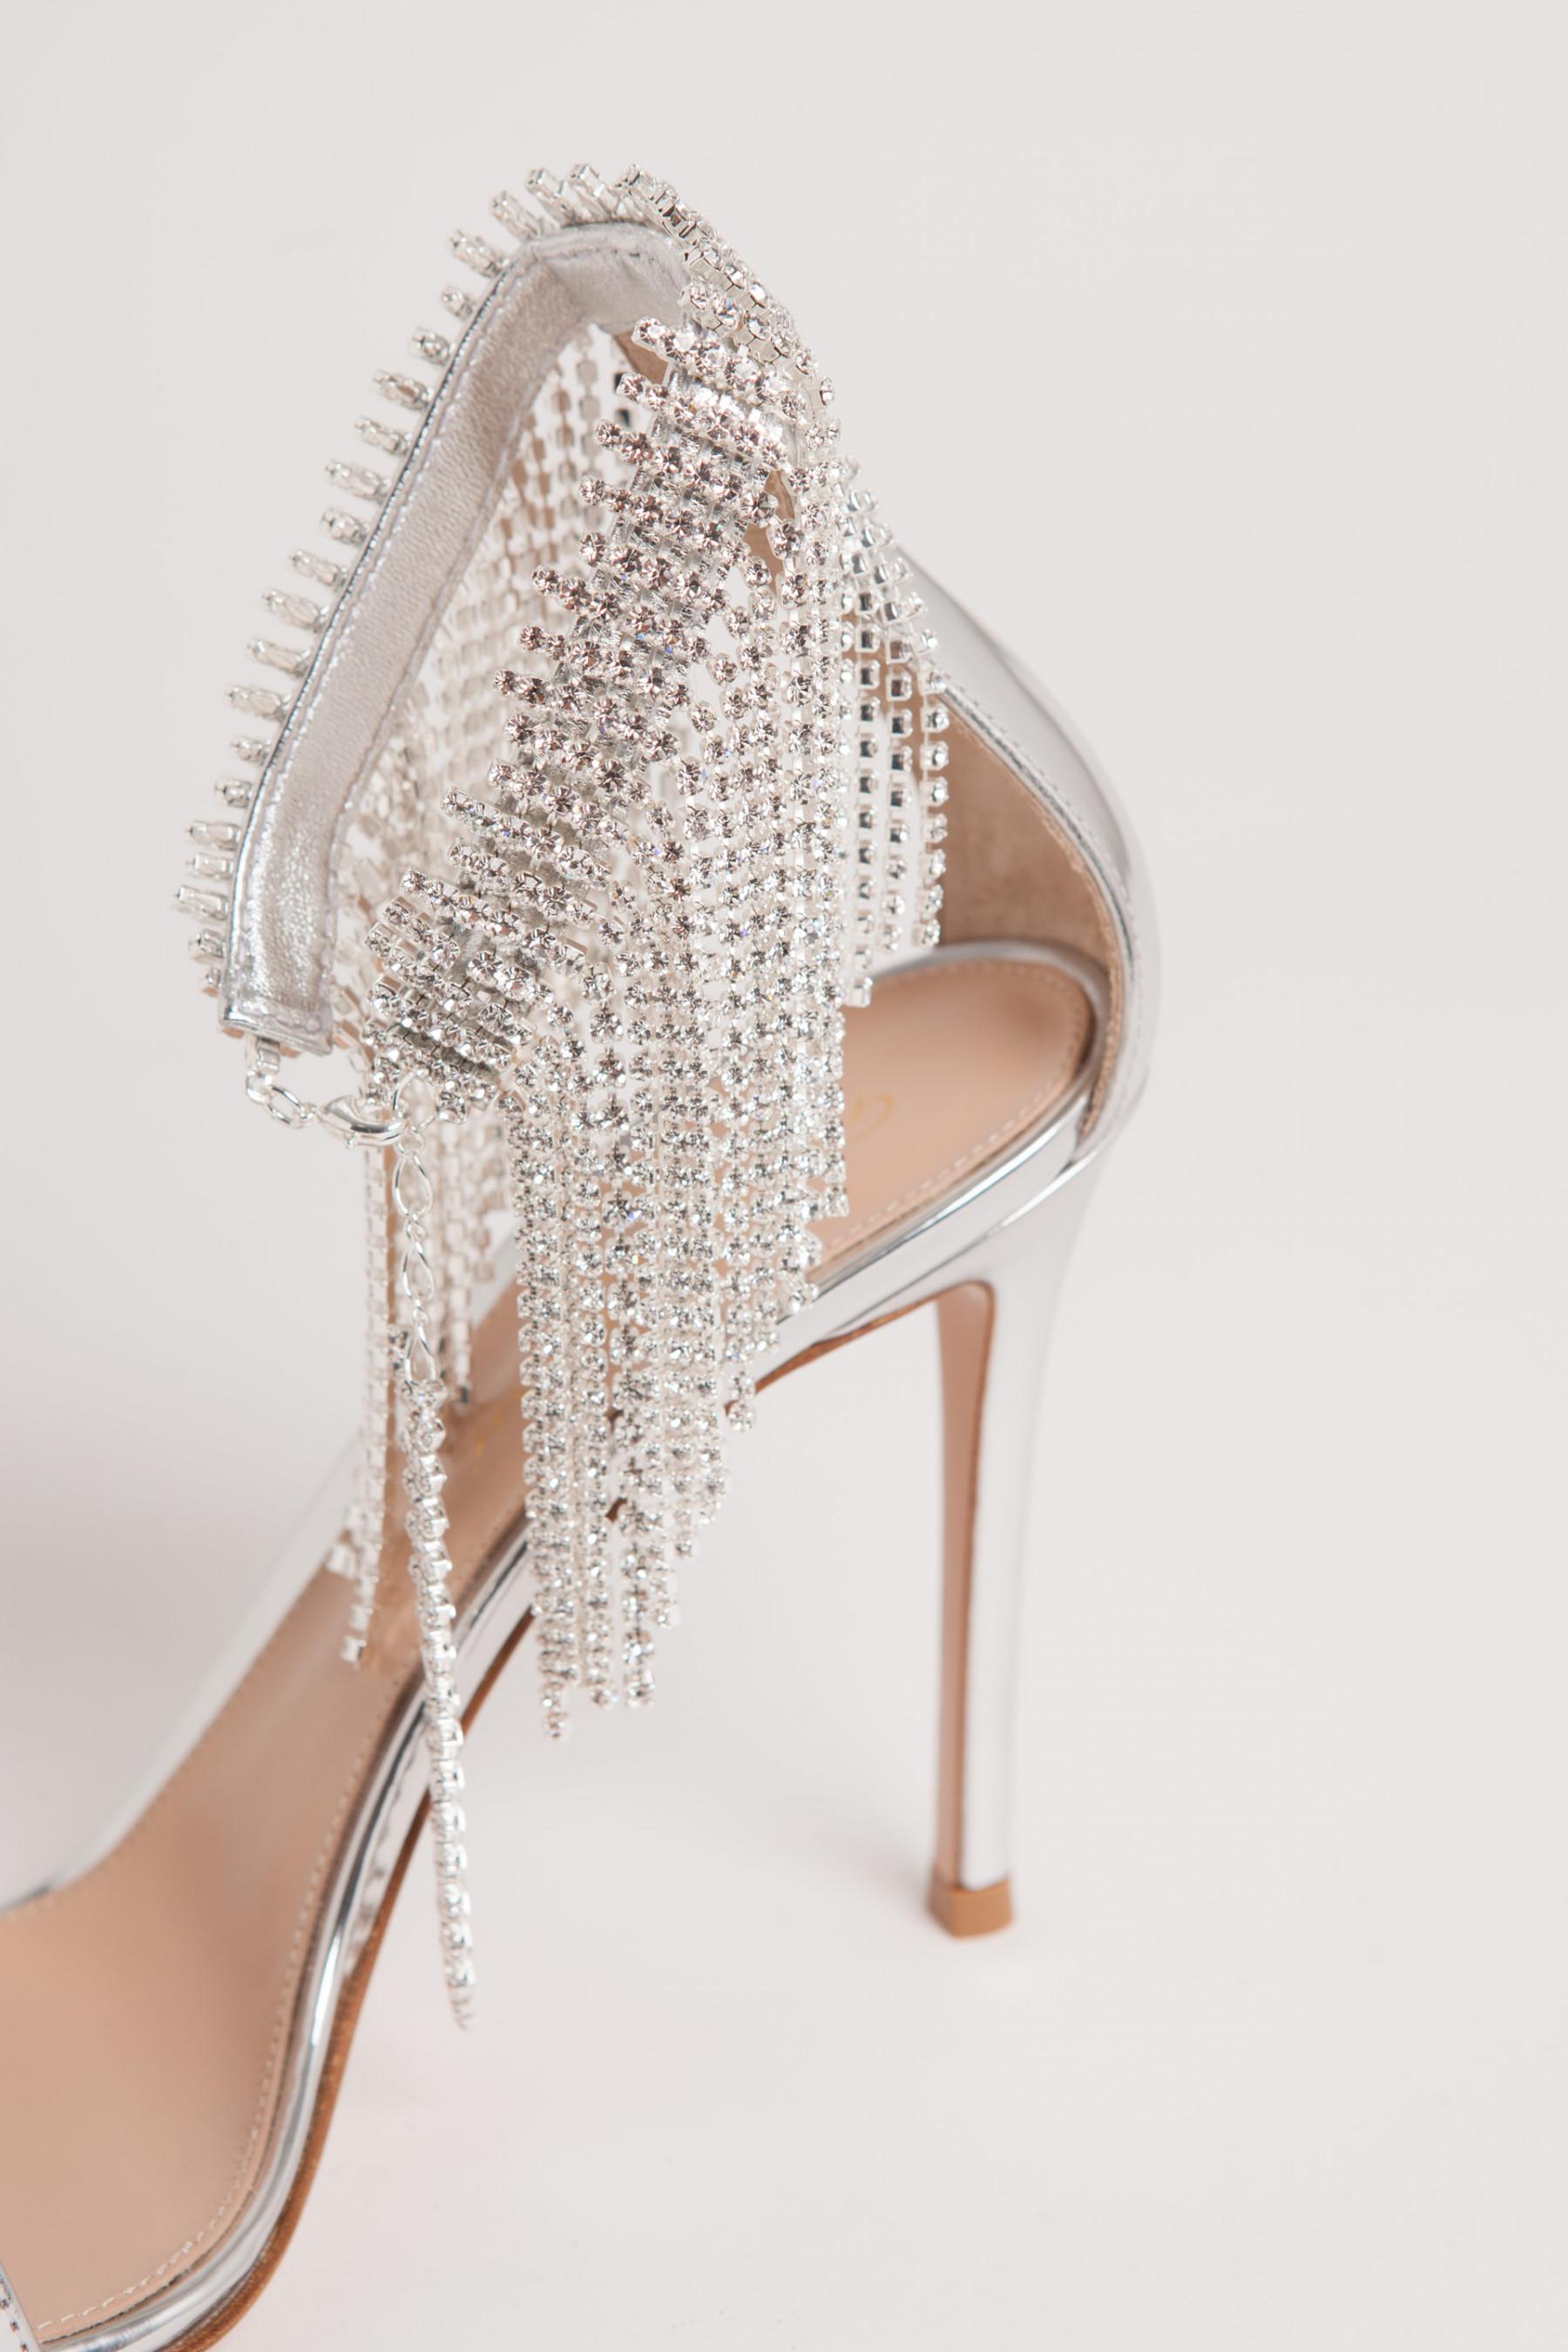 Sandales De Jasmin Gianvito Rossi - Métalliques 6LAgRaN83